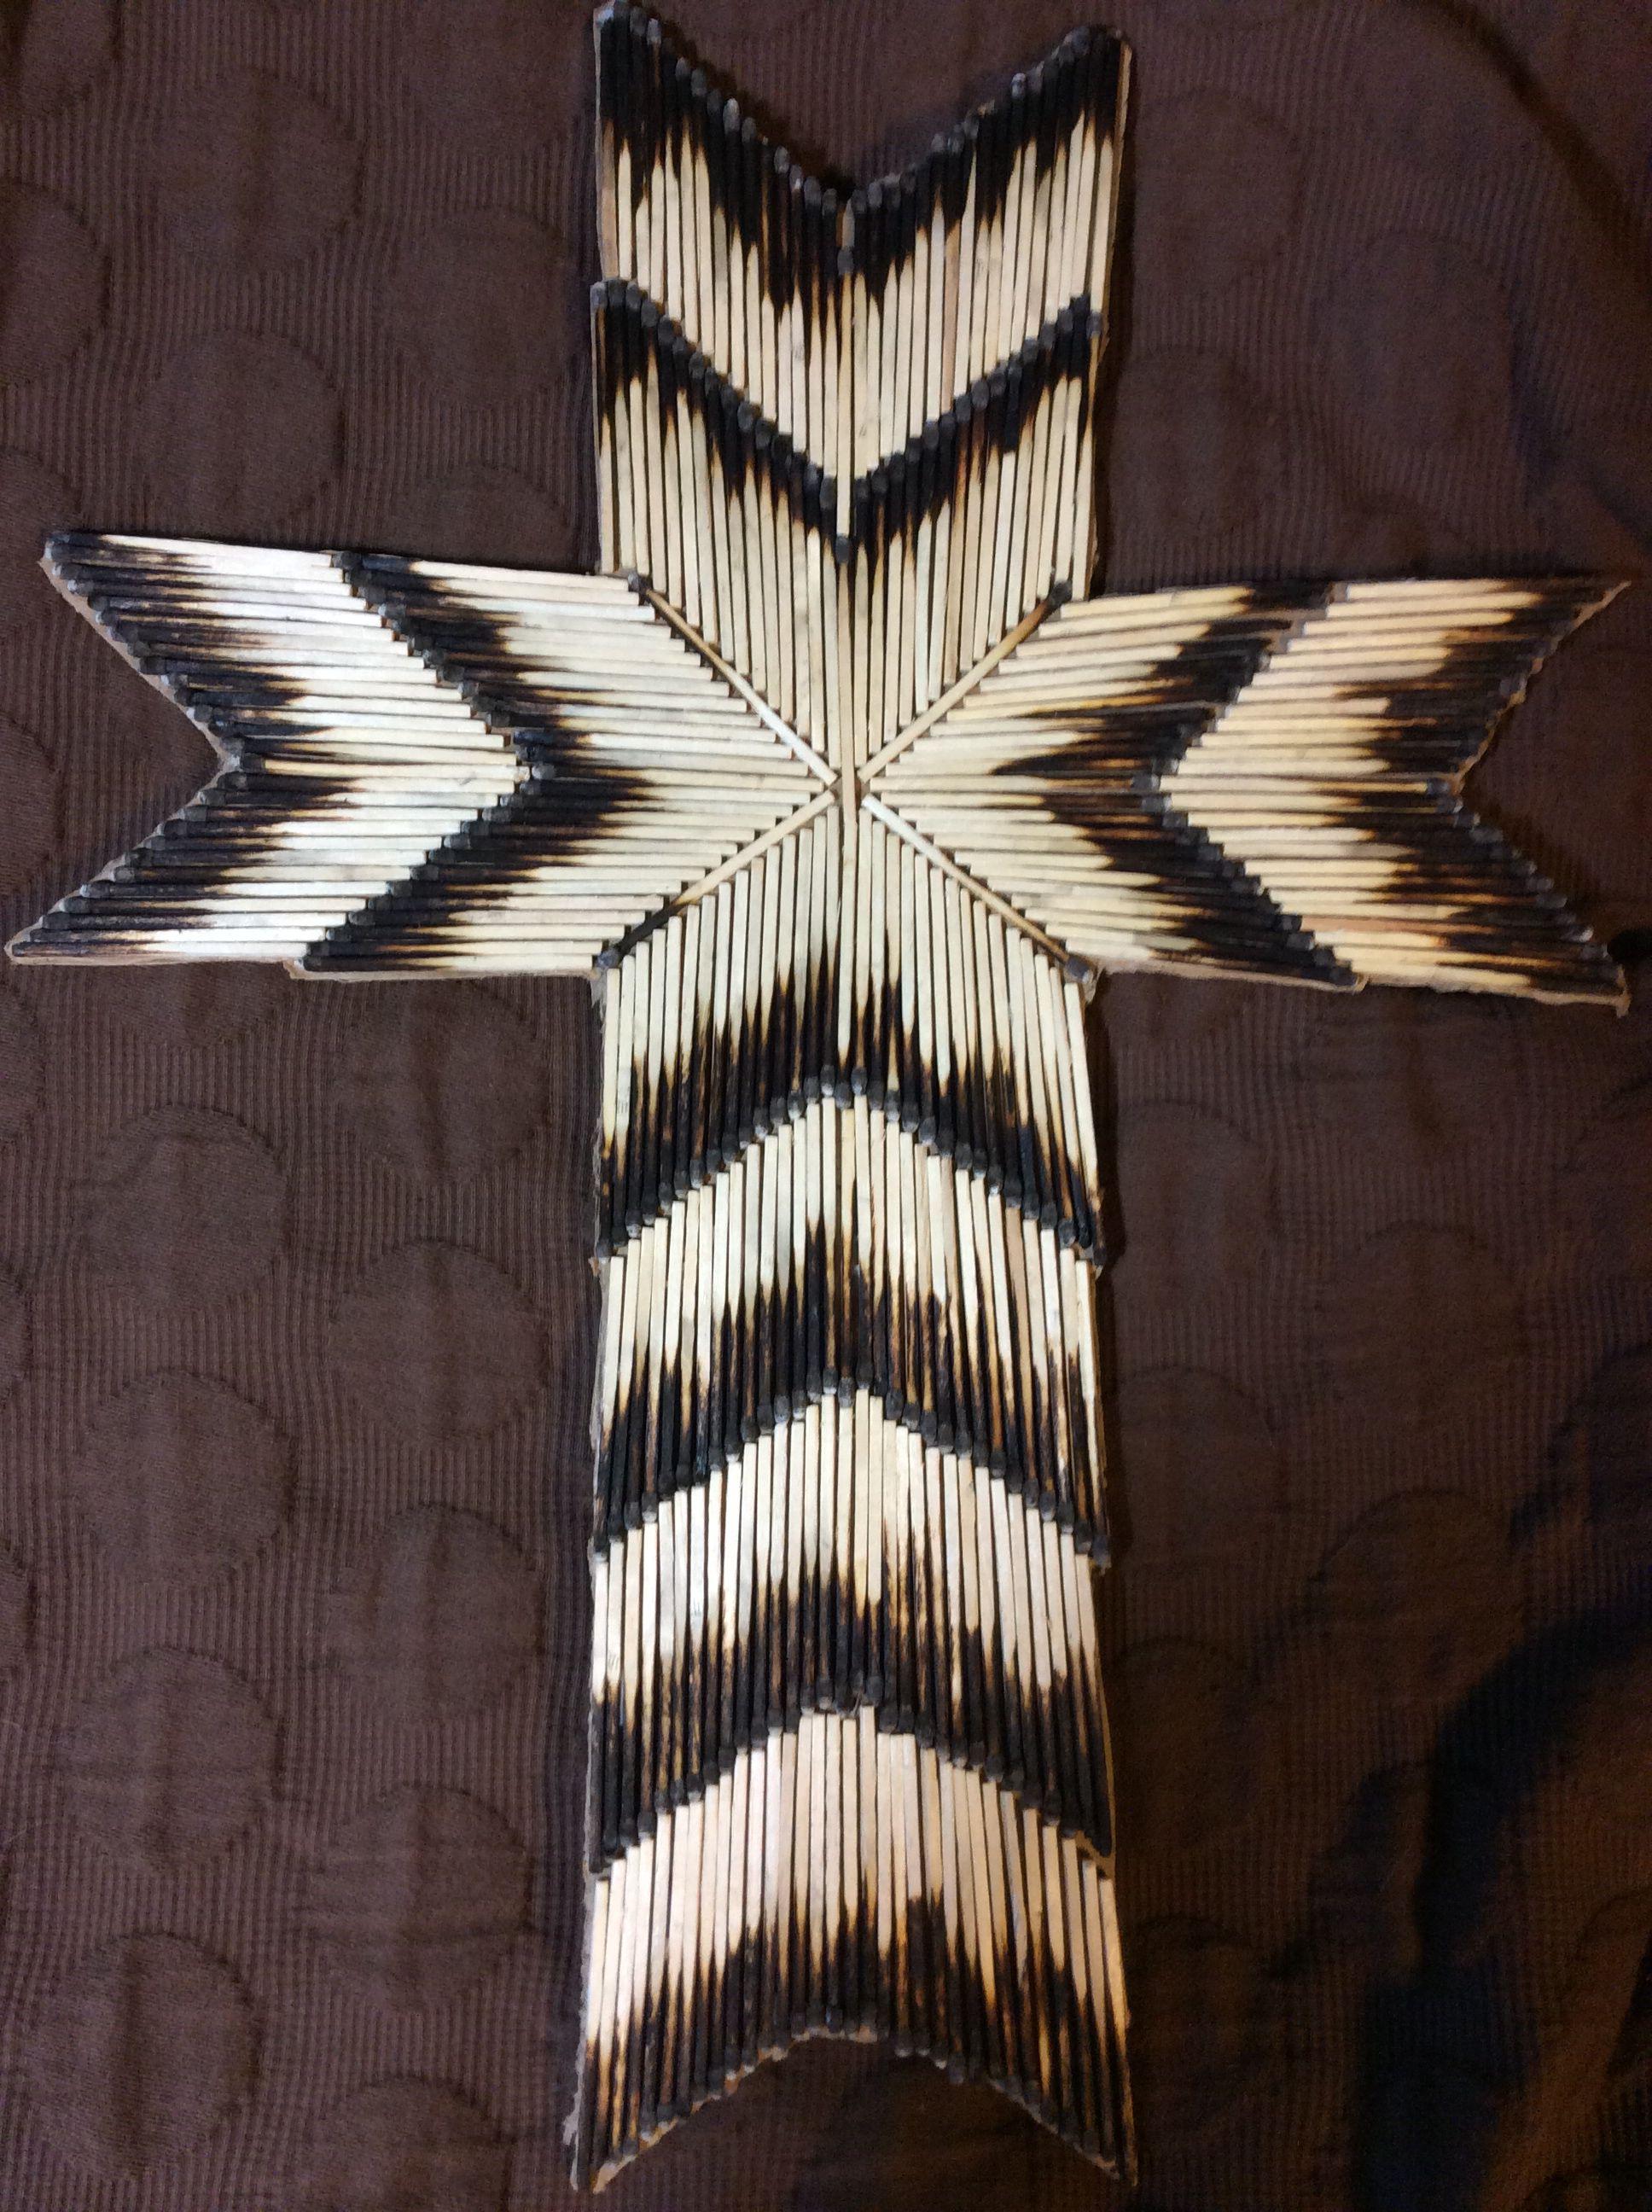 41+ Match stick craft designs ideas